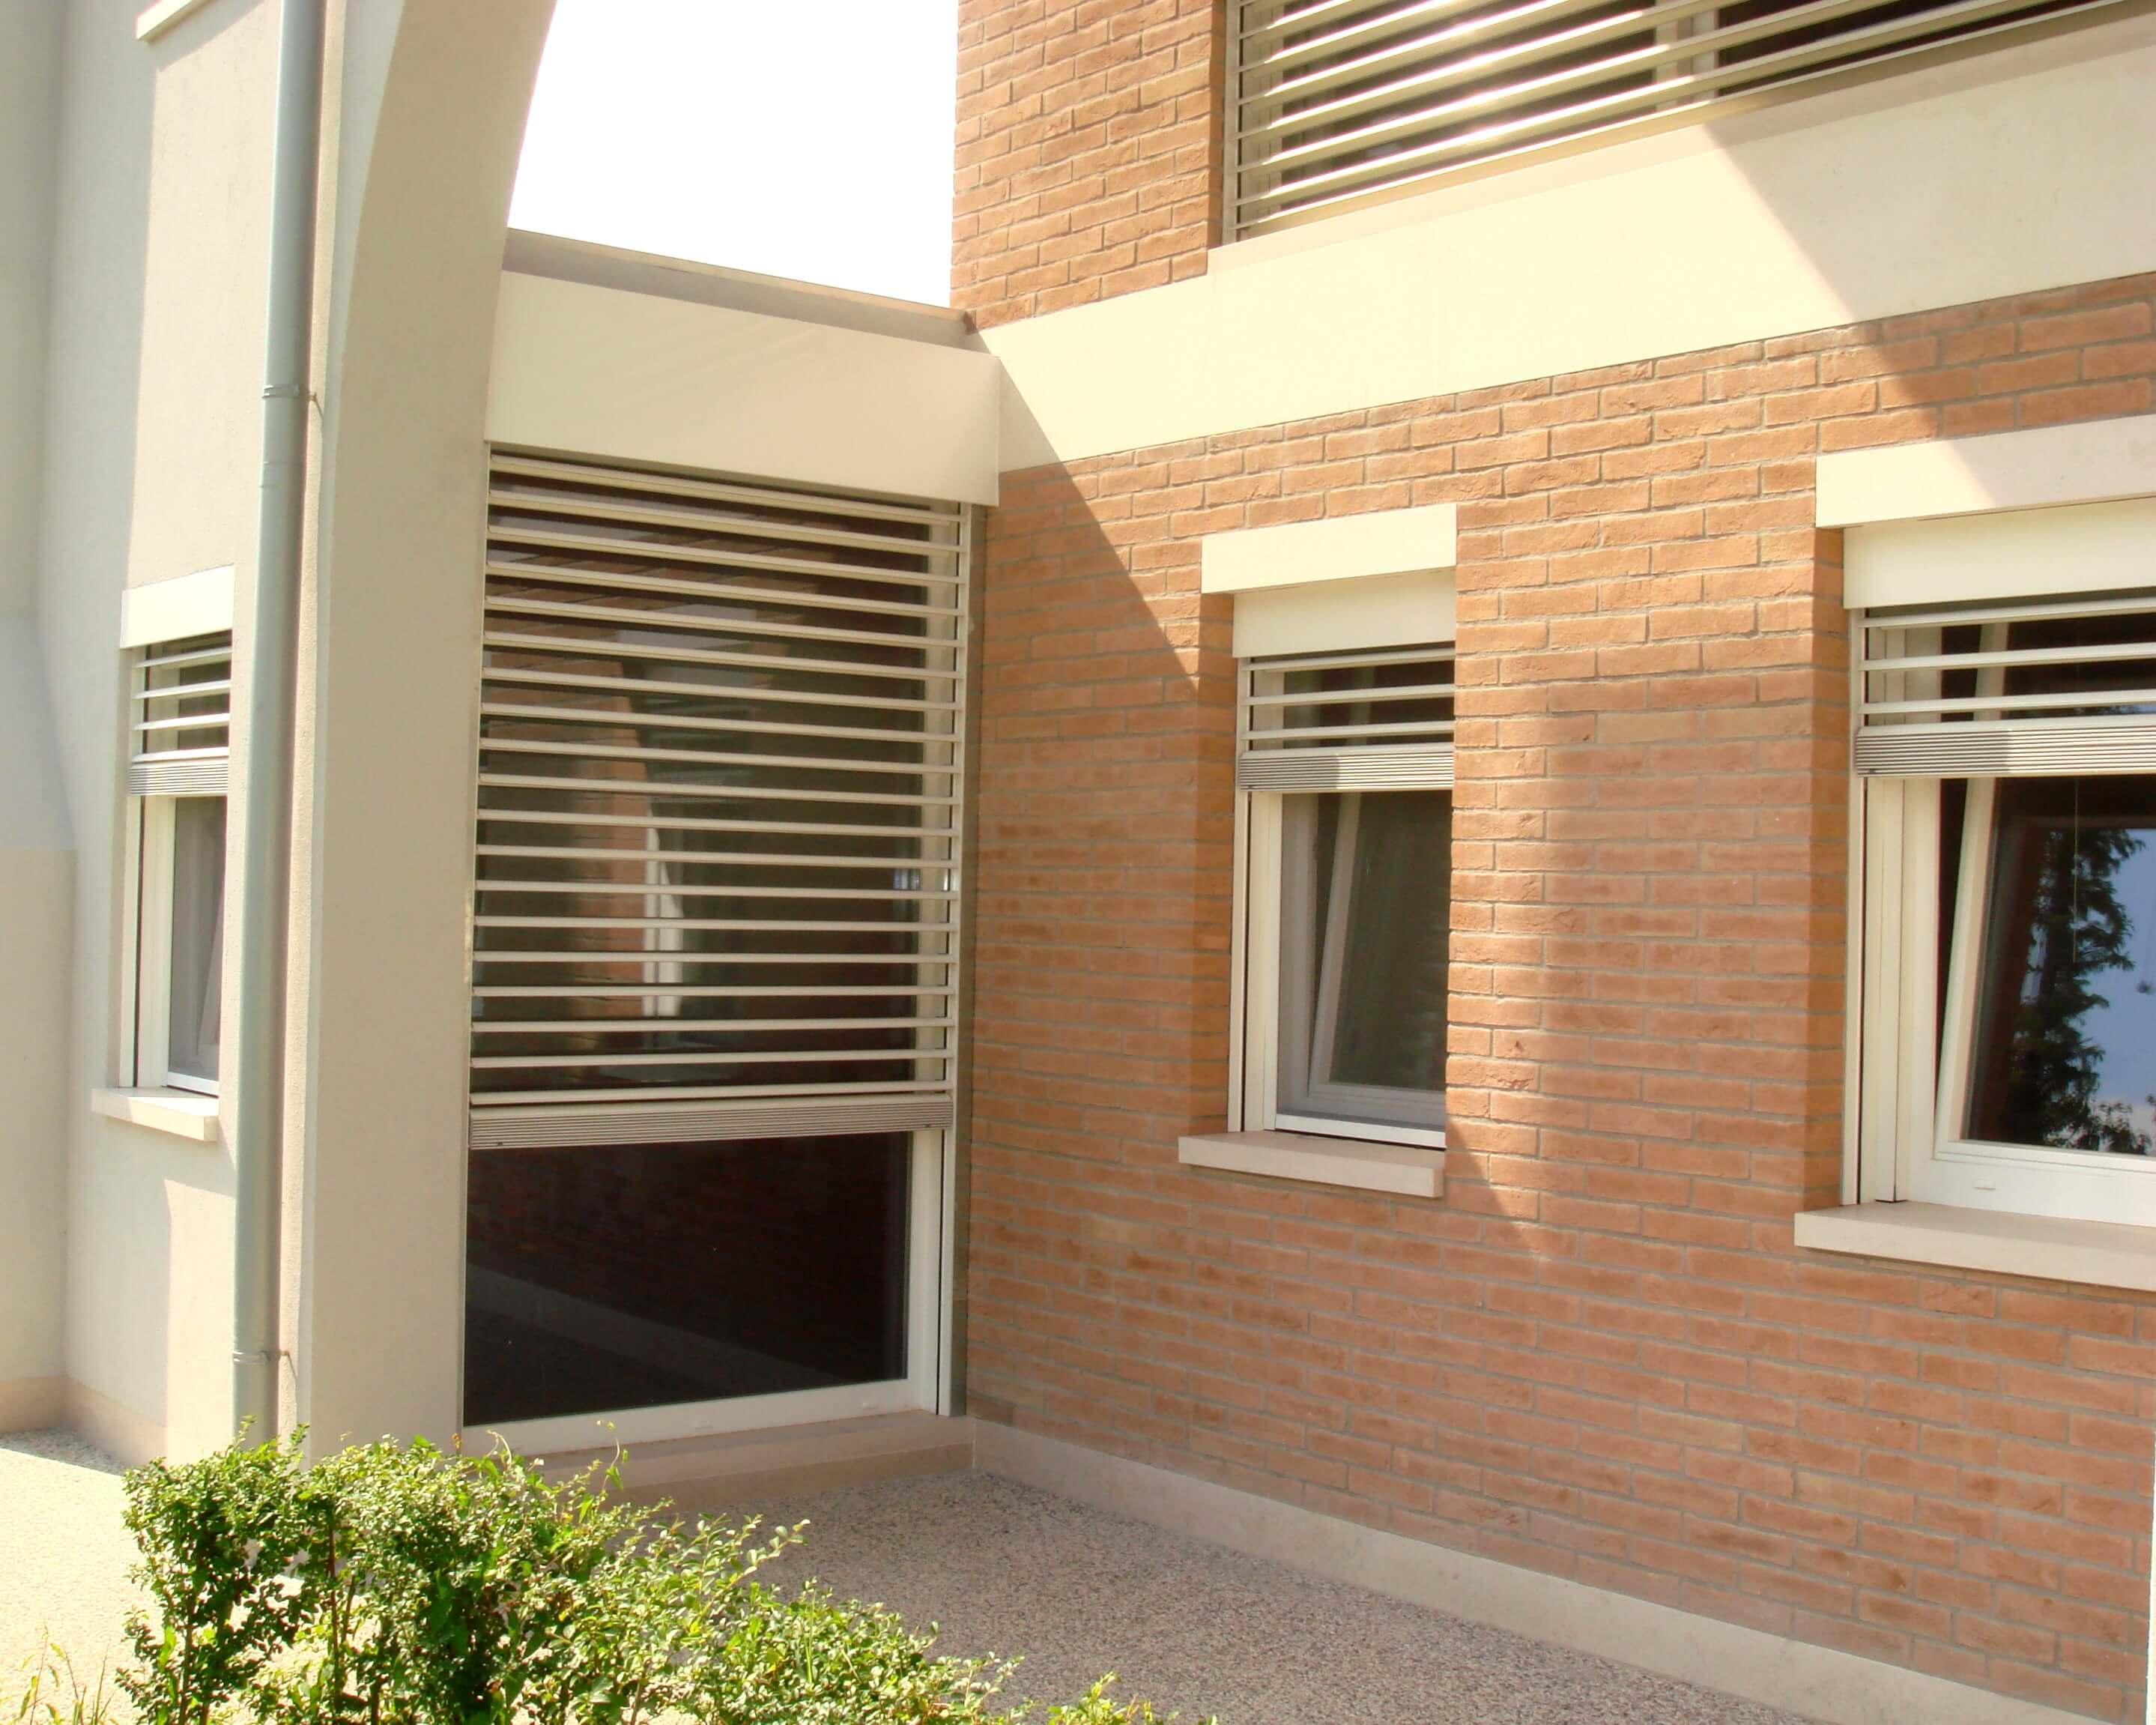 Frangisole imap casa for Ricambi tende velux